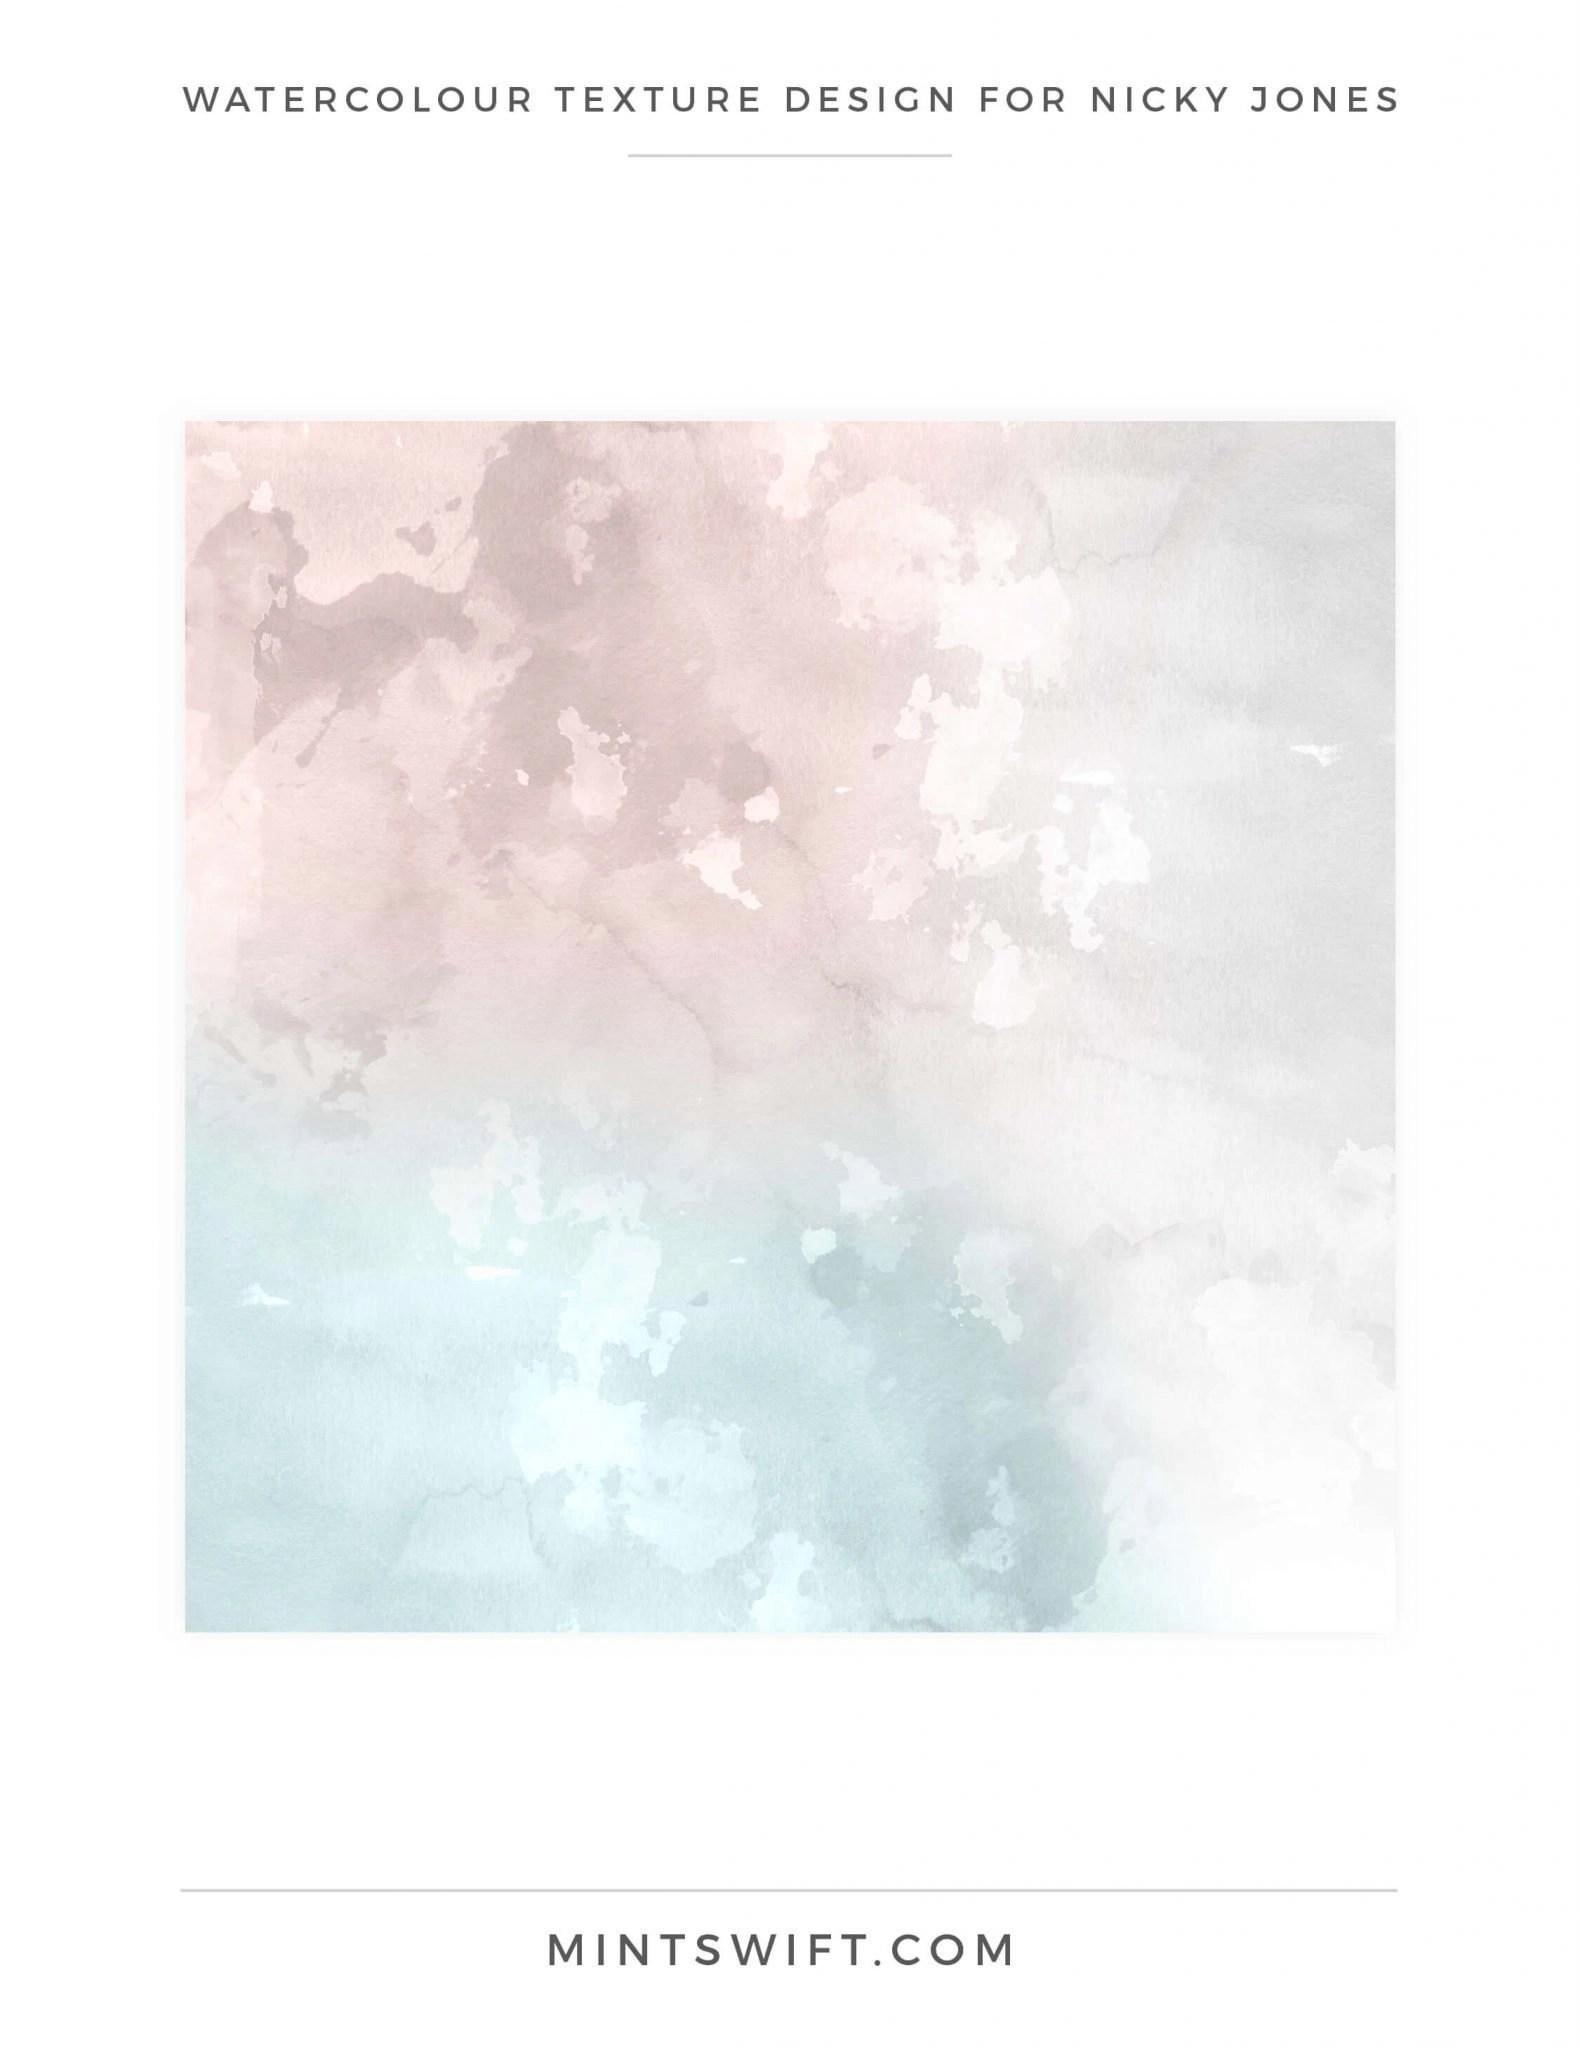 Nicky Jones - Watercolour Texture Design - Brand Design Package - MintSwift